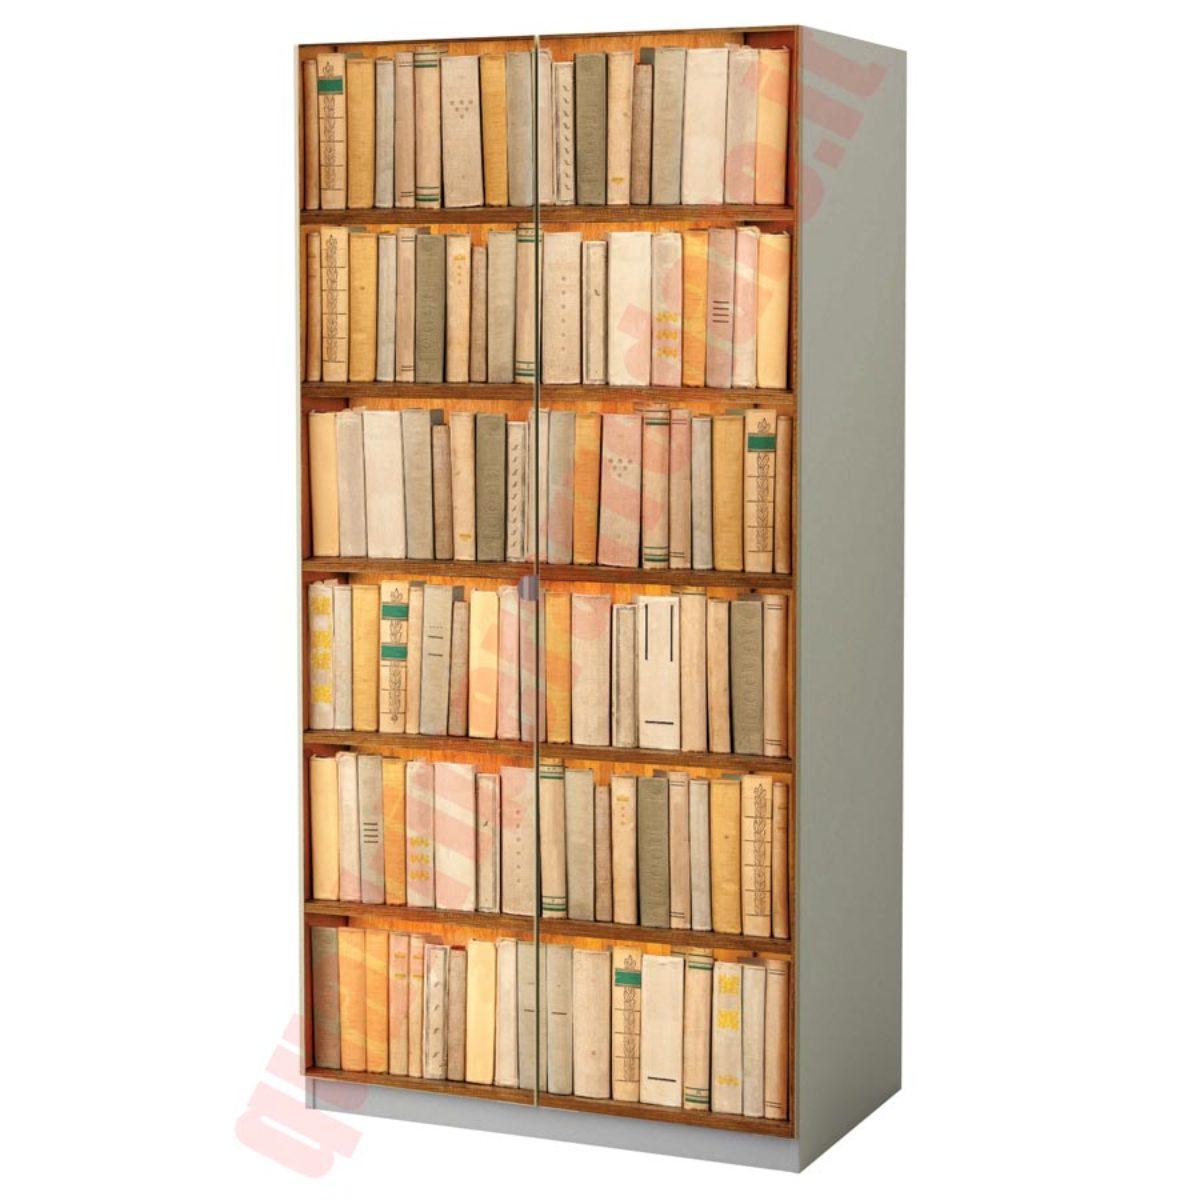 Adesivi Armadio Ikea adesivo armadio finta libreria